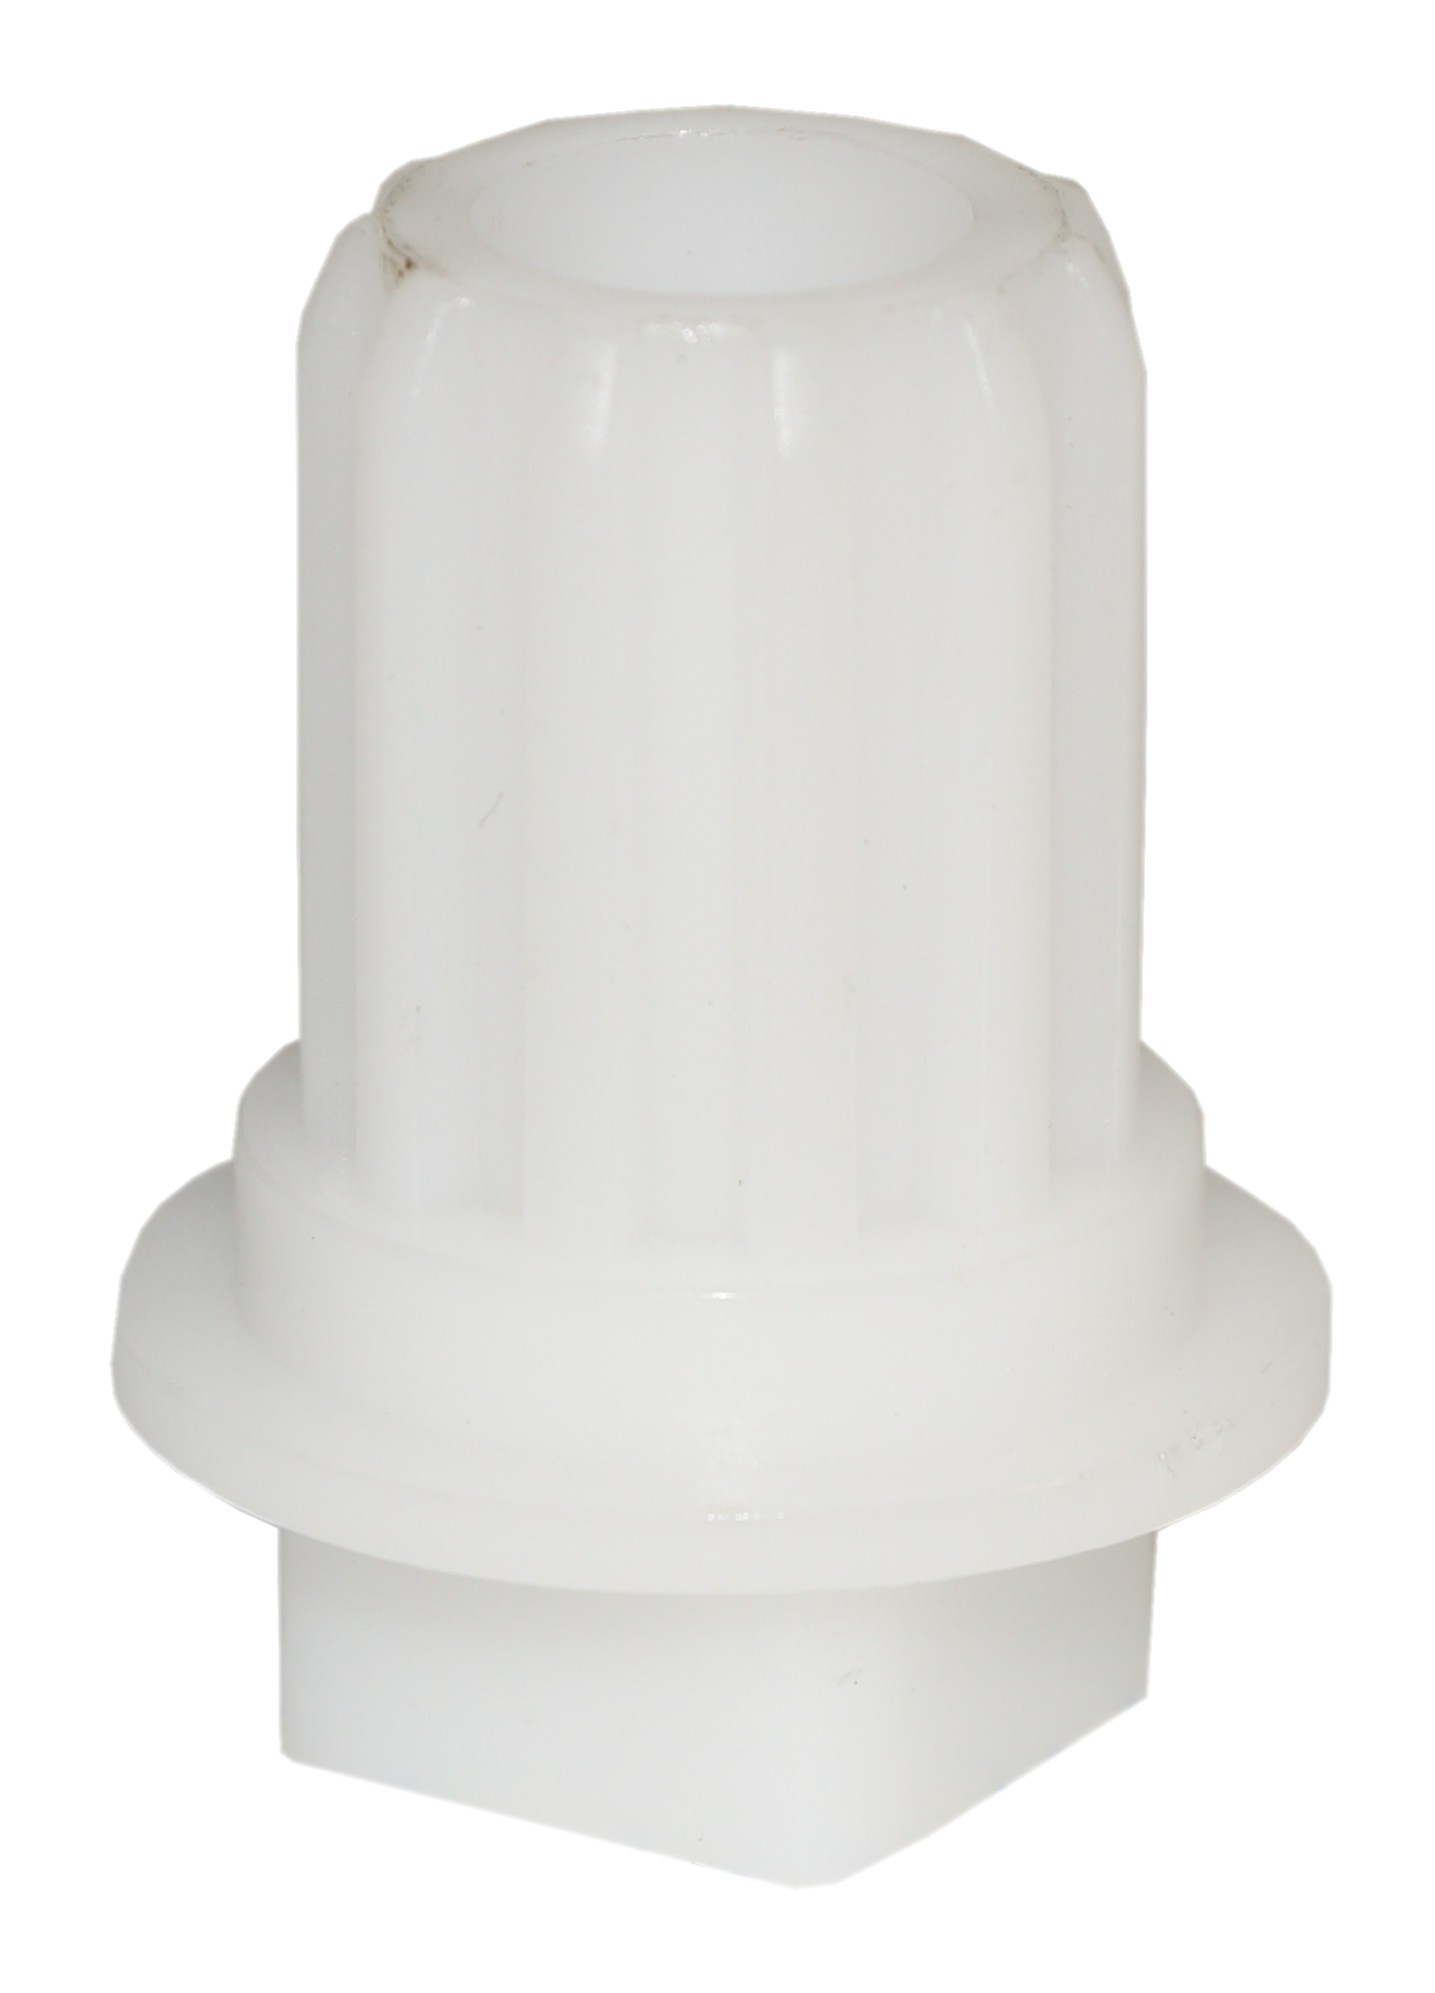 Втулка шнека мясорубки Philips HR2726, HR2727, HR2728 P/N: 996510049323